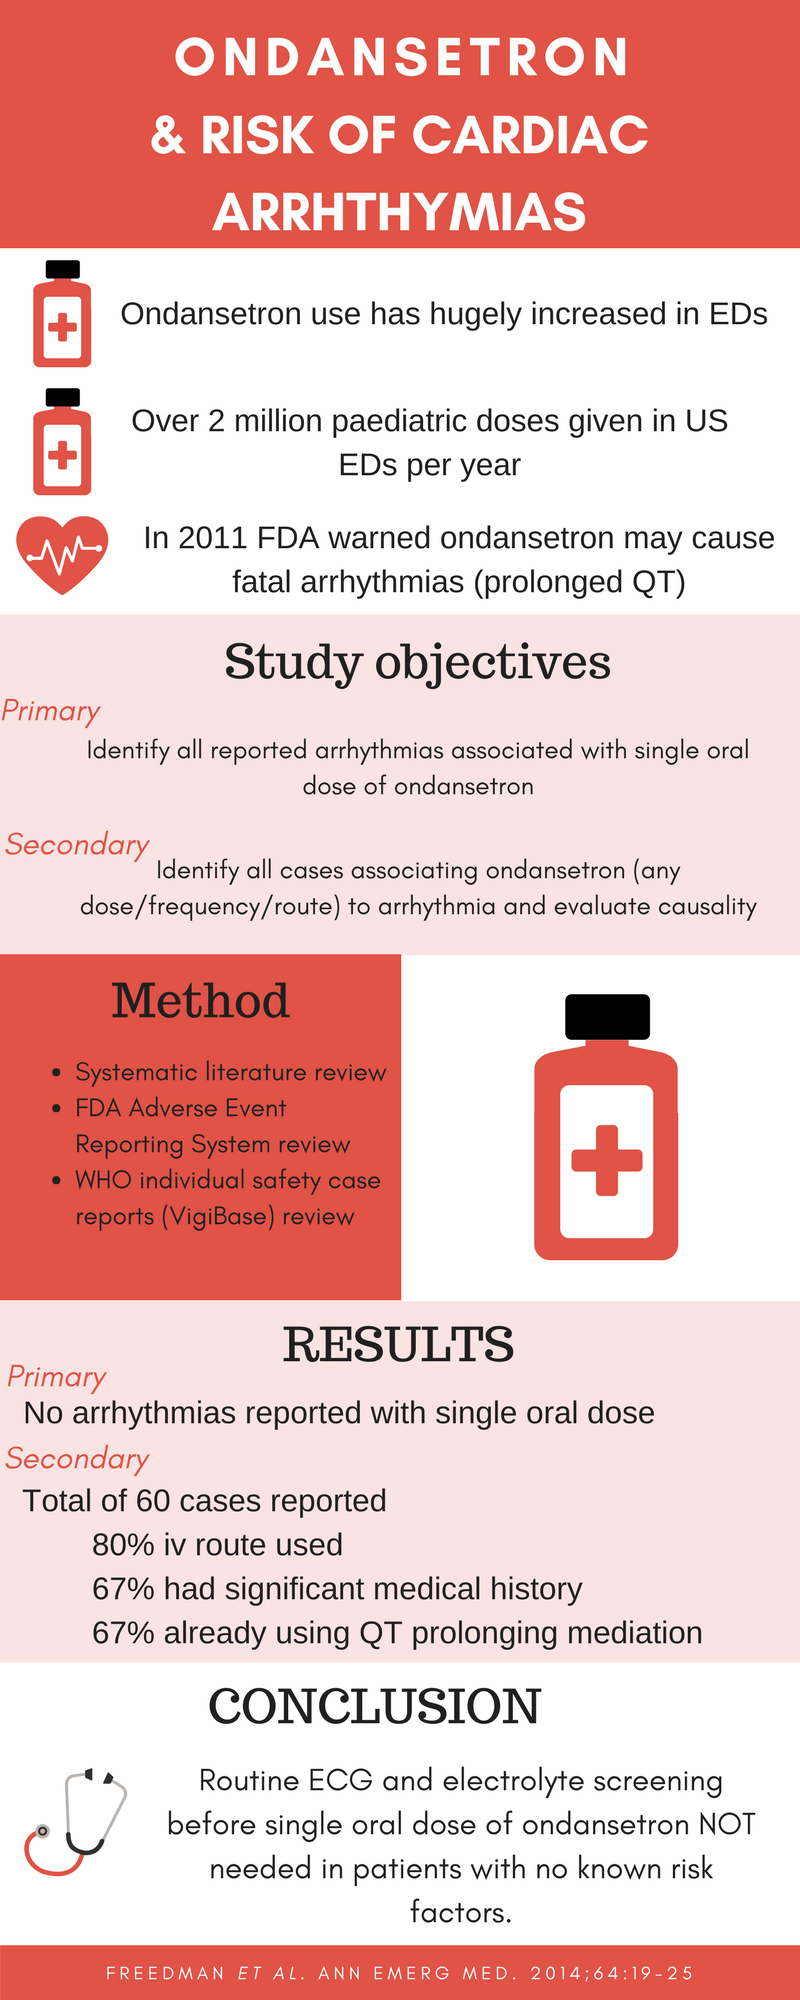 characteristics and effects of cardiac arrhythmia Effect of yoga on arrhythmia burden, anxiety, depression, and quality of life in paroxysmal atrial fibrillation.